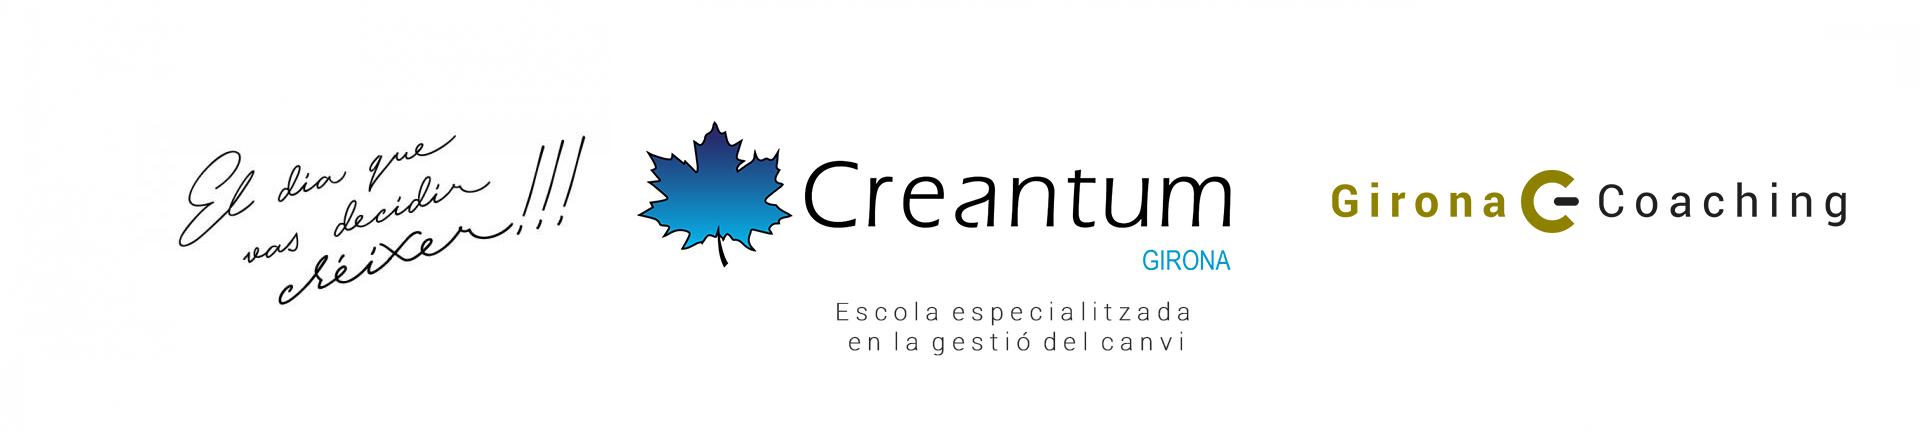 INICI WEB CREANTUM GIRONA-1